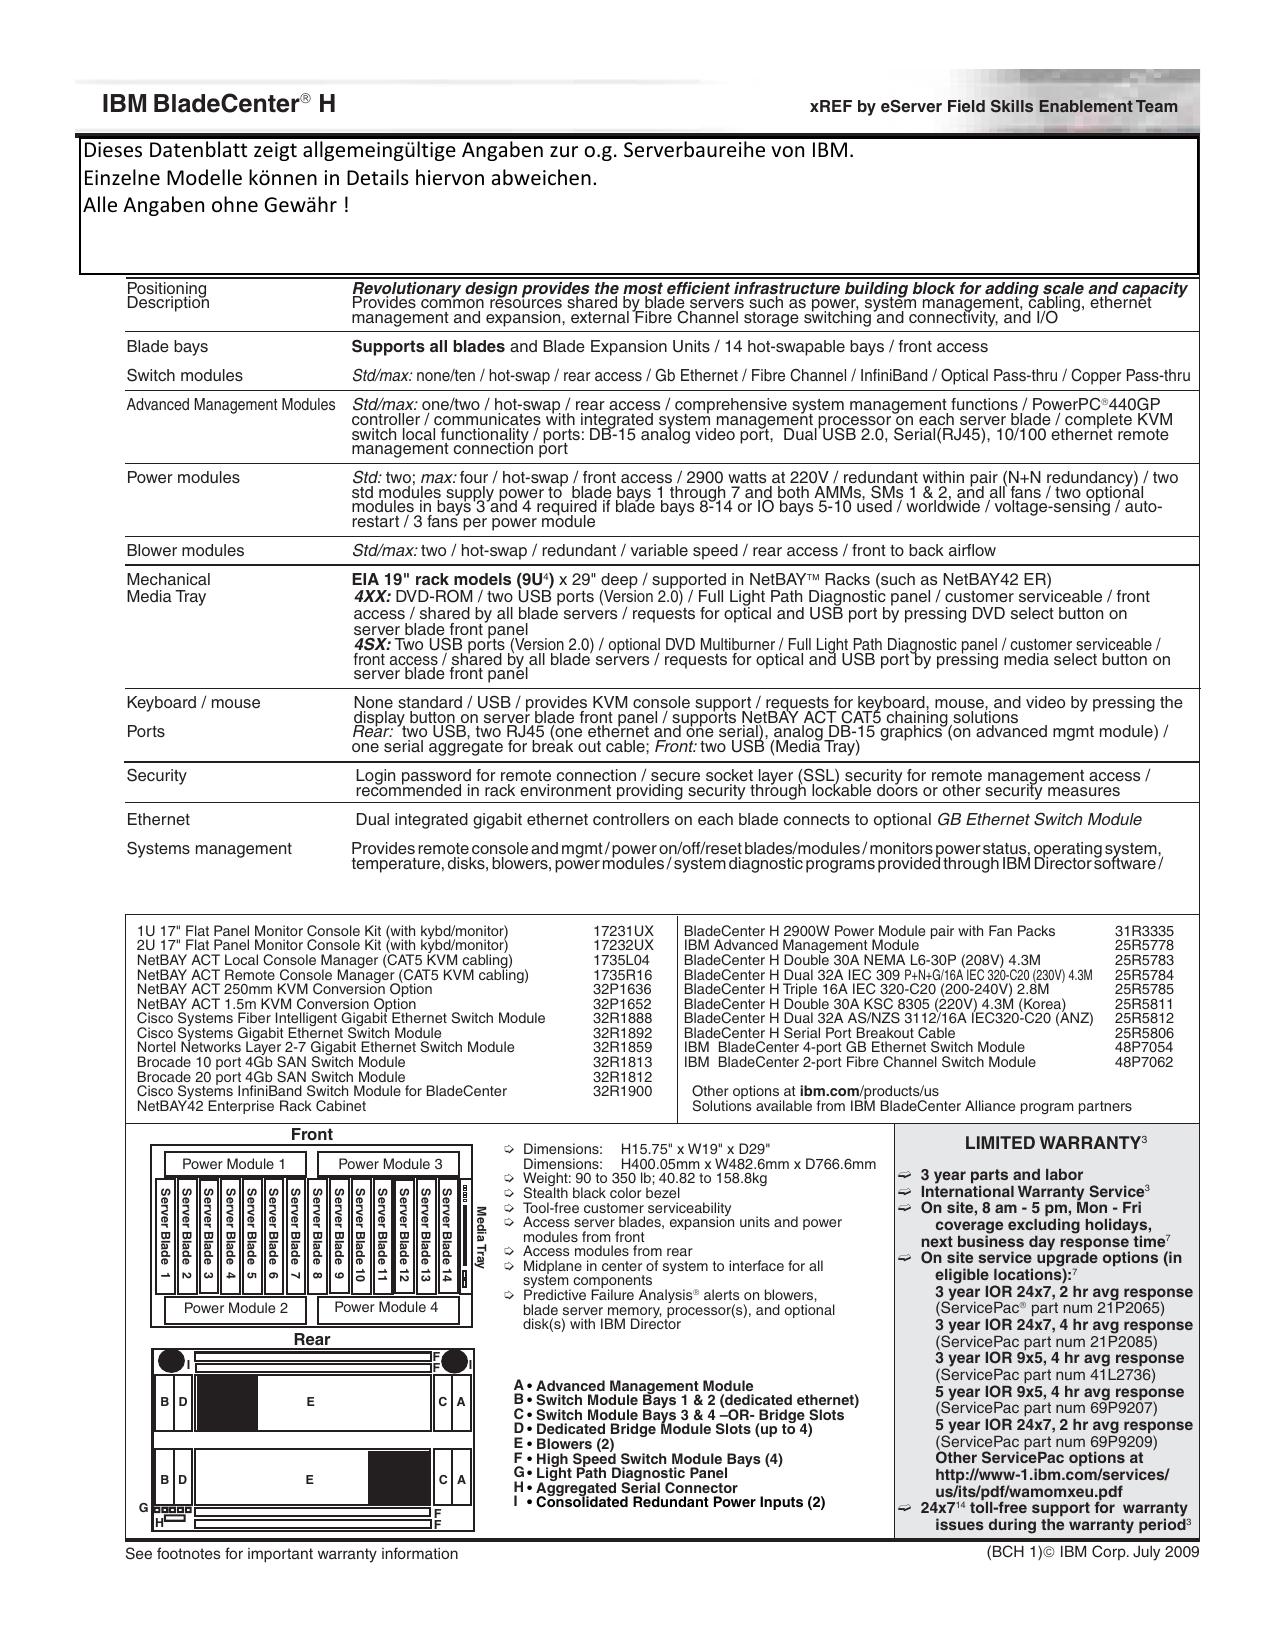 IBM Bladecenter H Serial Port Breakout Cable